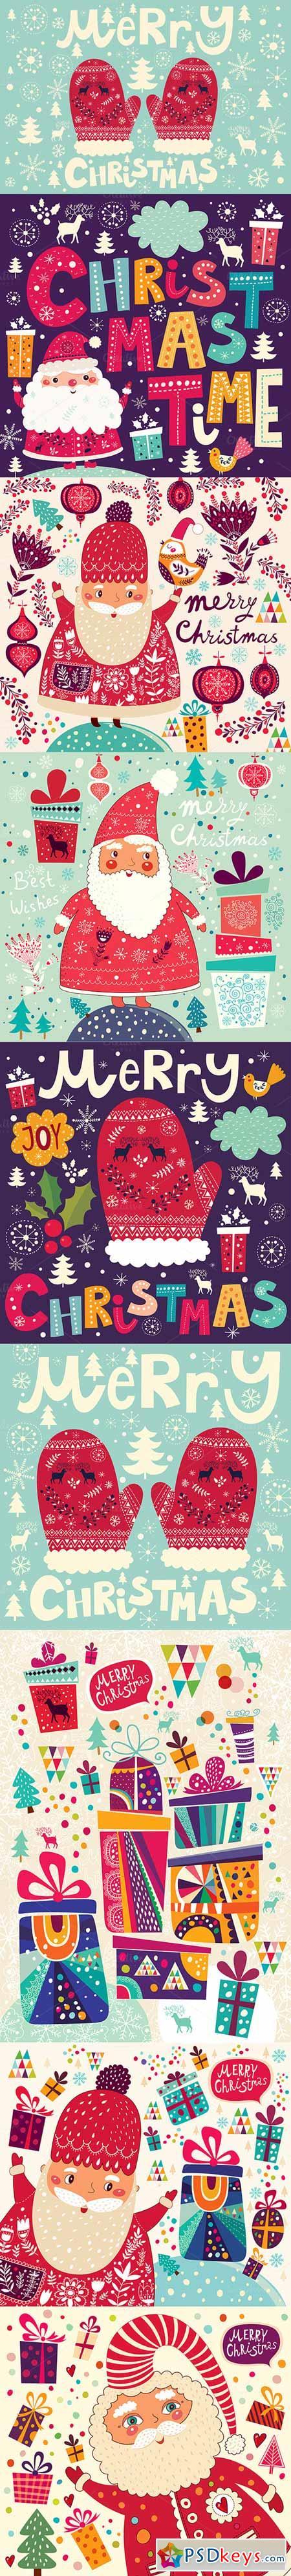 Bundle of Christmas illustrations 450897